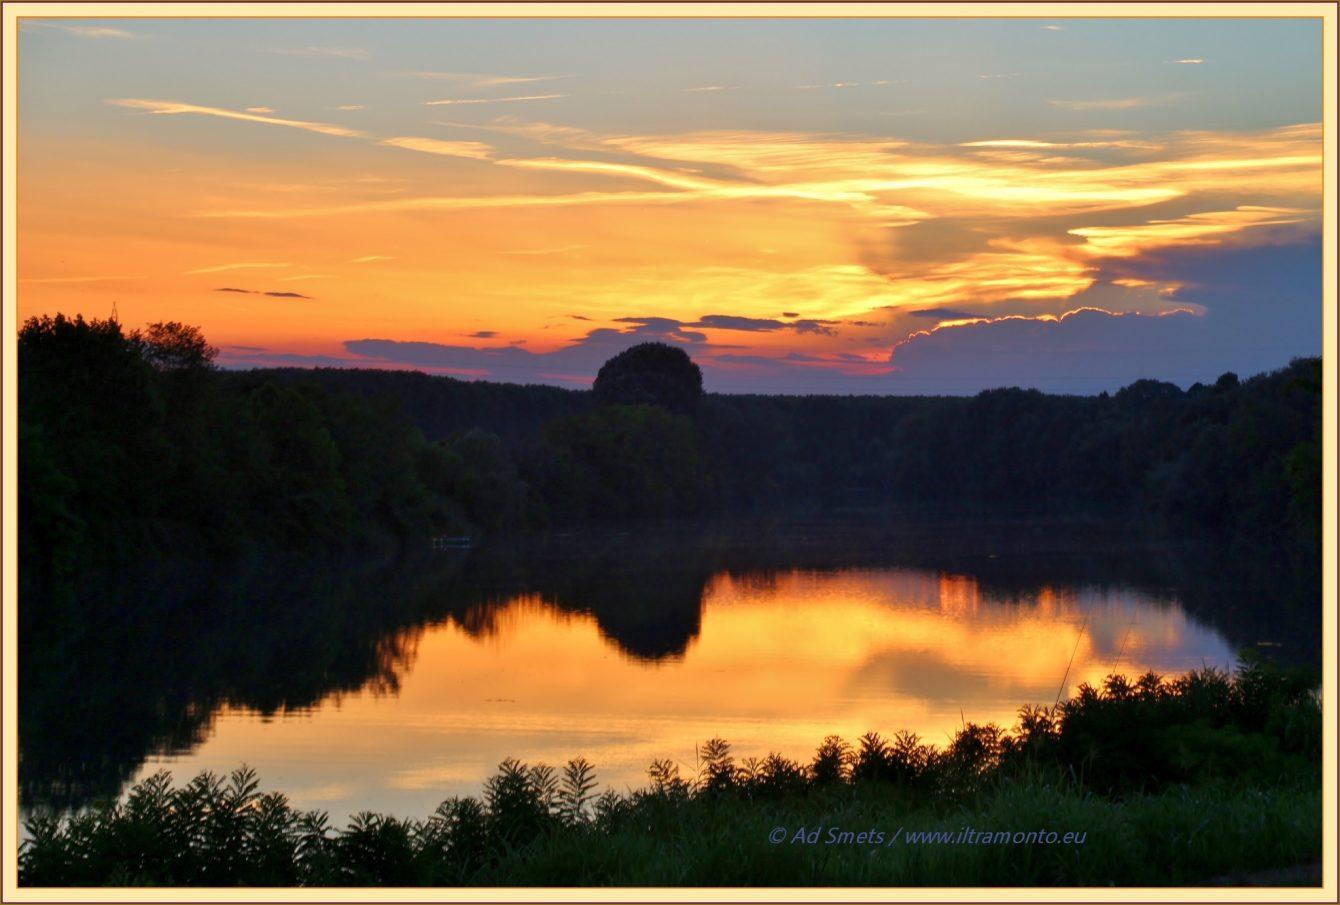 ad-smets_6509_zonsondergang_il-tramonto